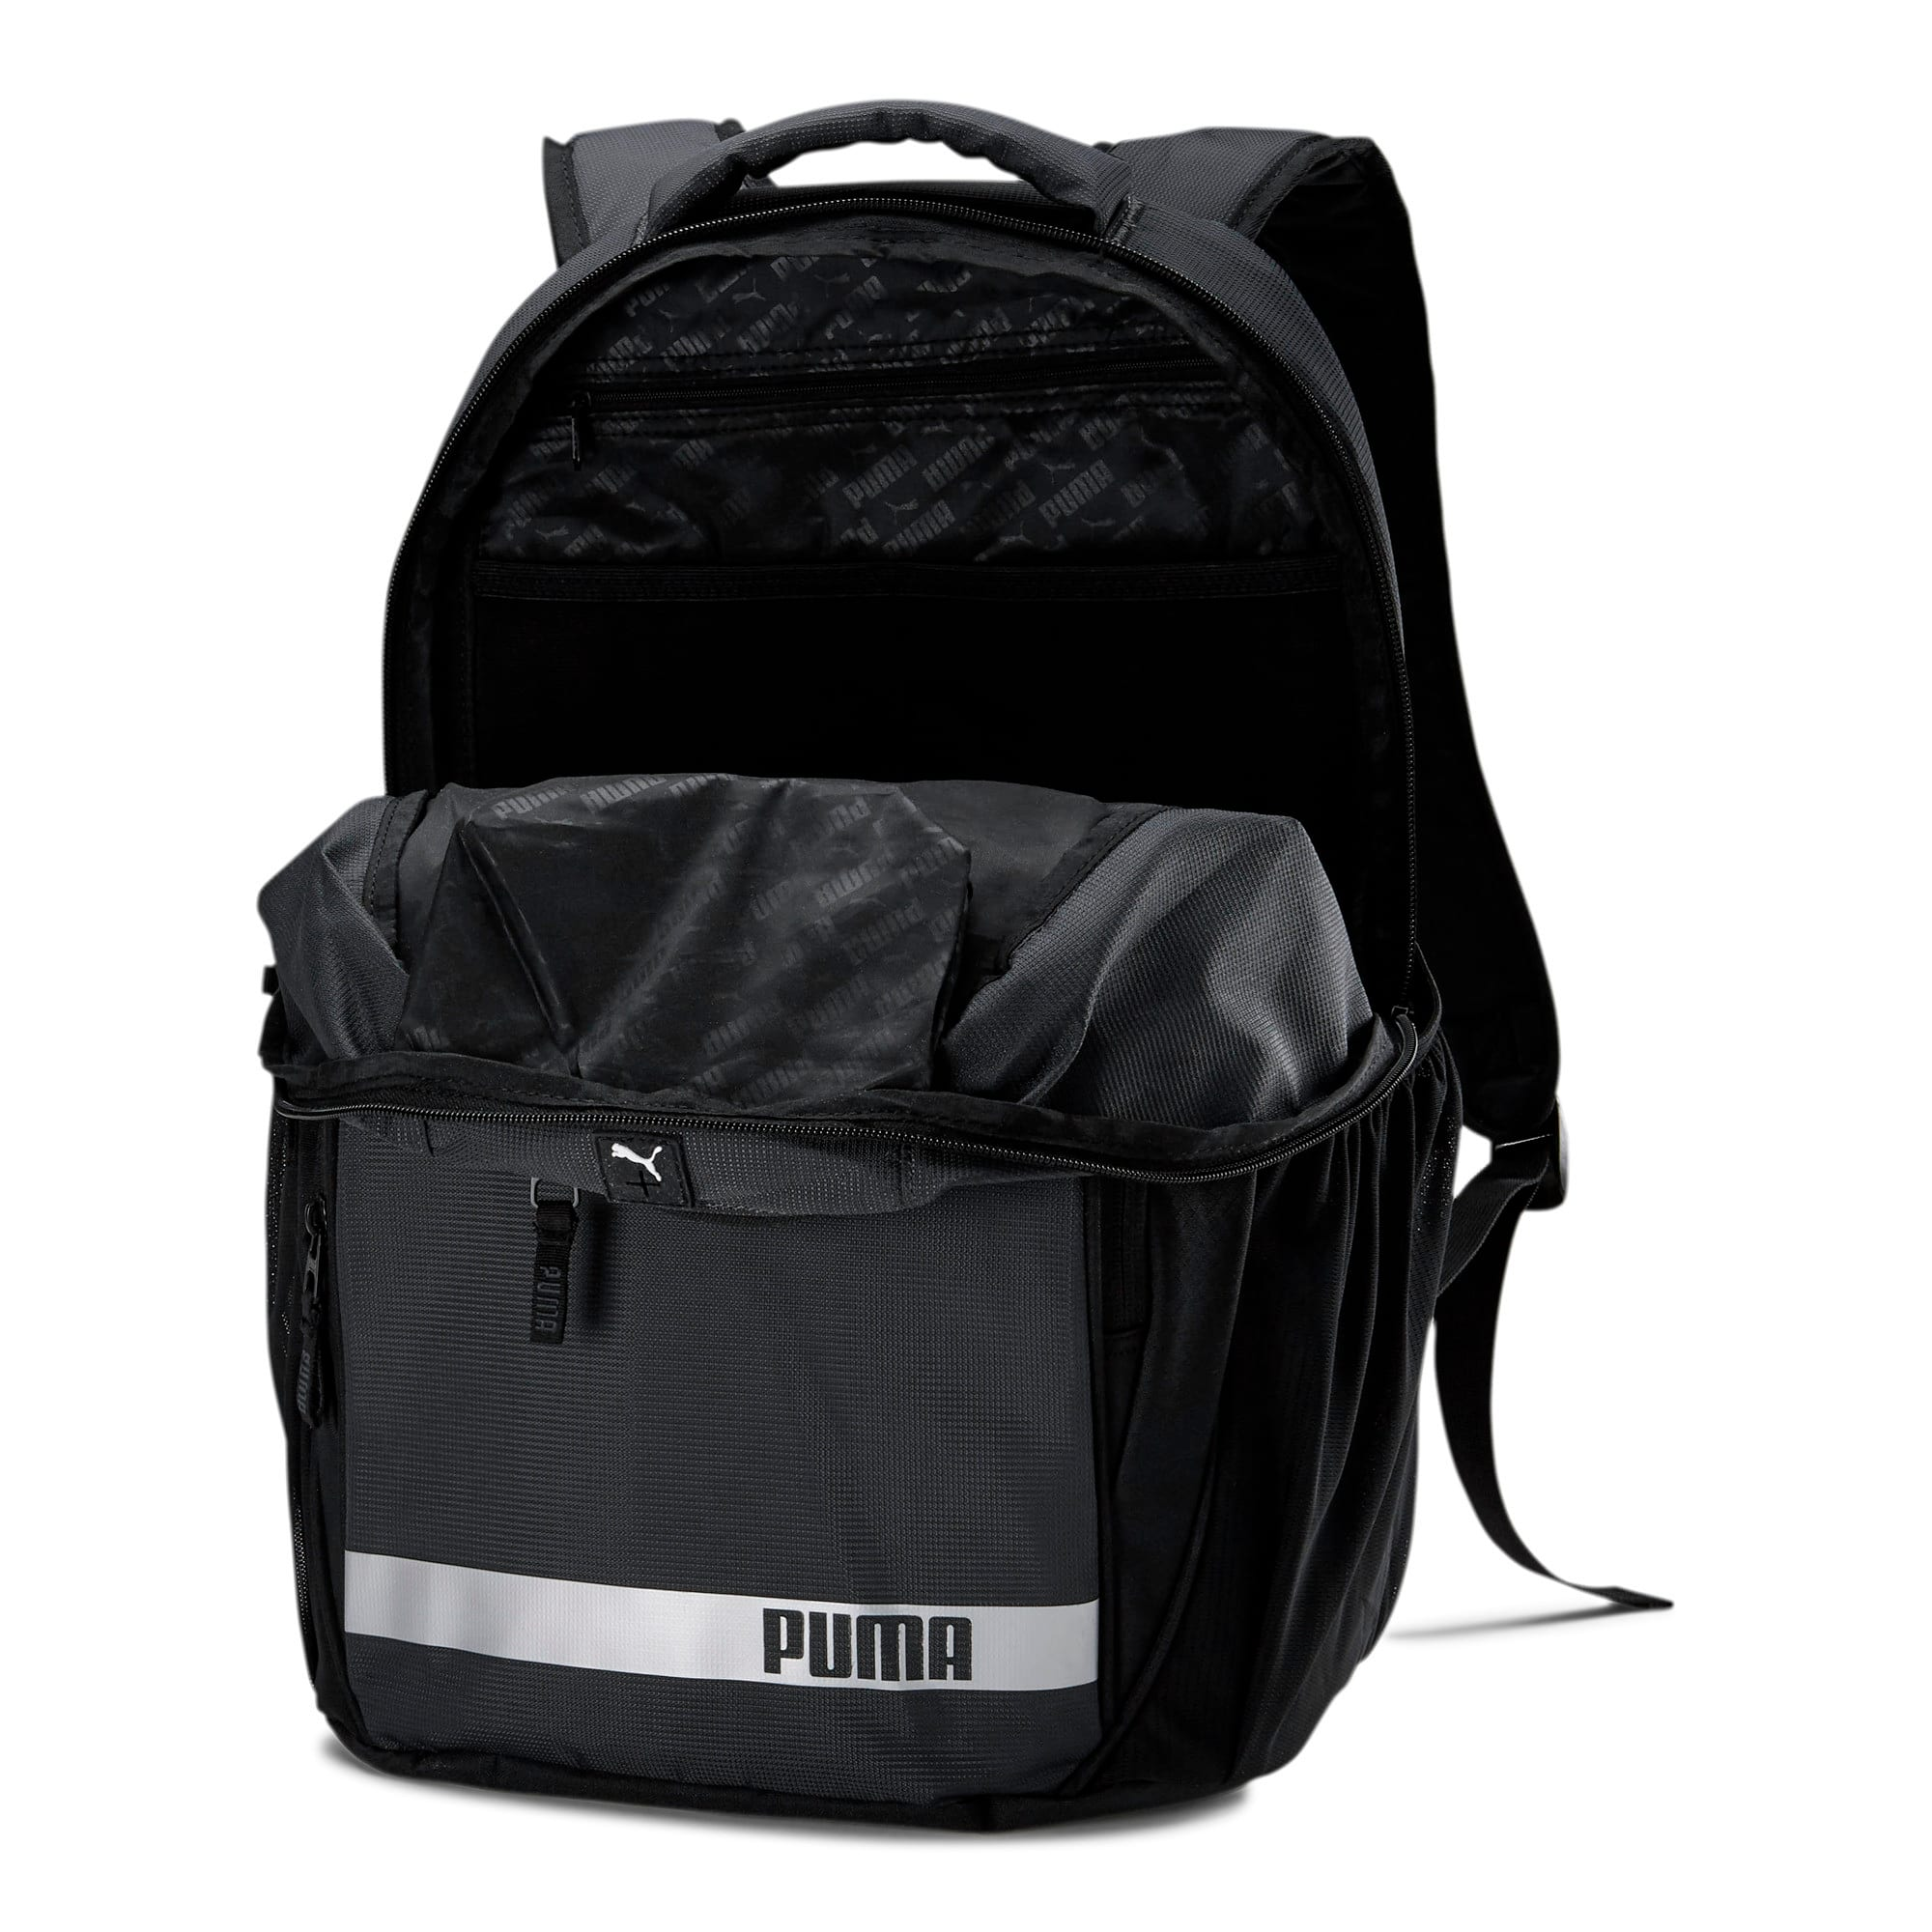 Thumbnail 3 of Formation 2.0 Ball Backpack, Dark Grey, medium